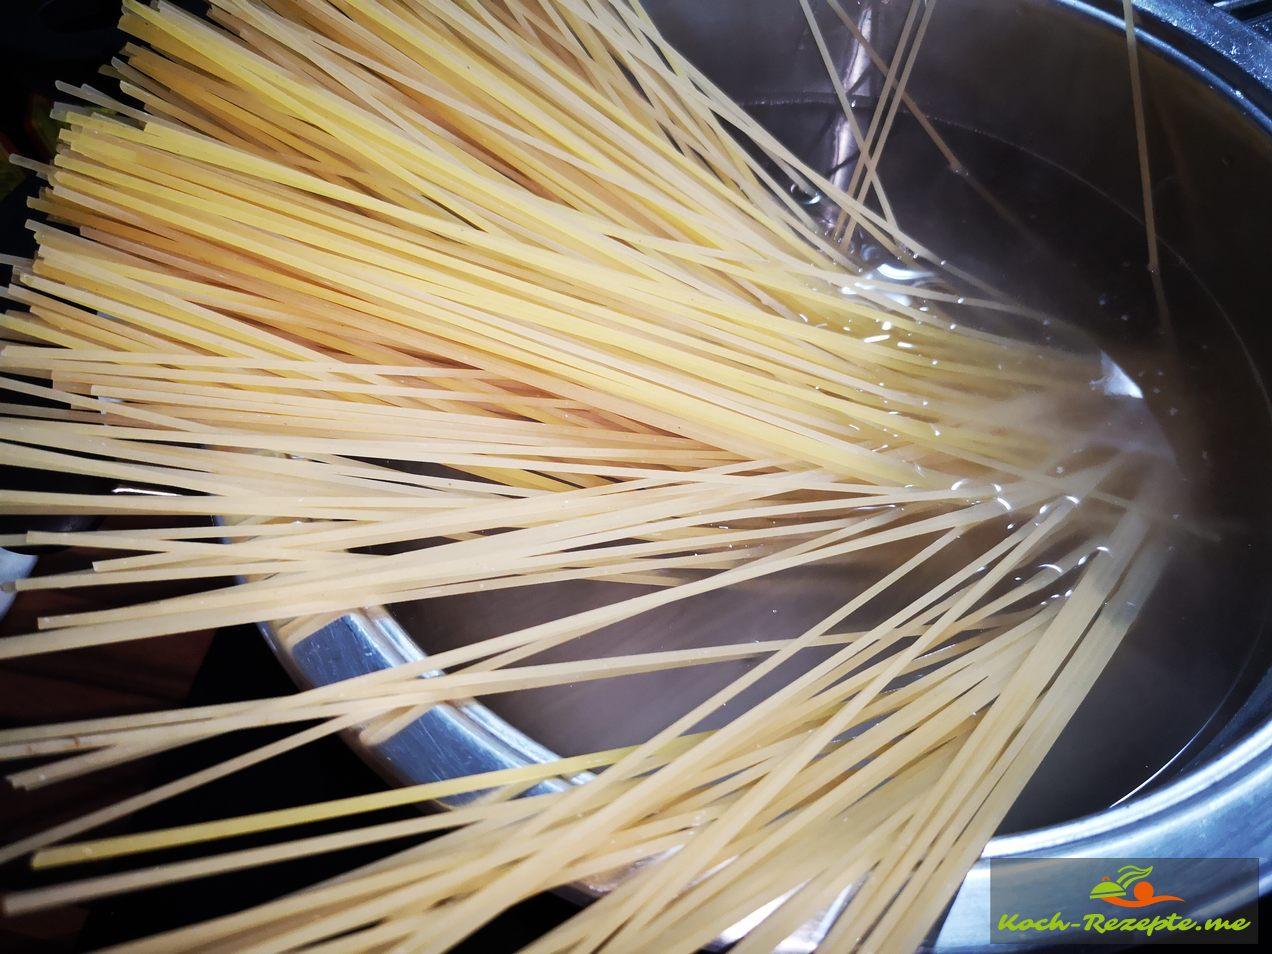 pro Person 70 g trockene Spaghetti kochen